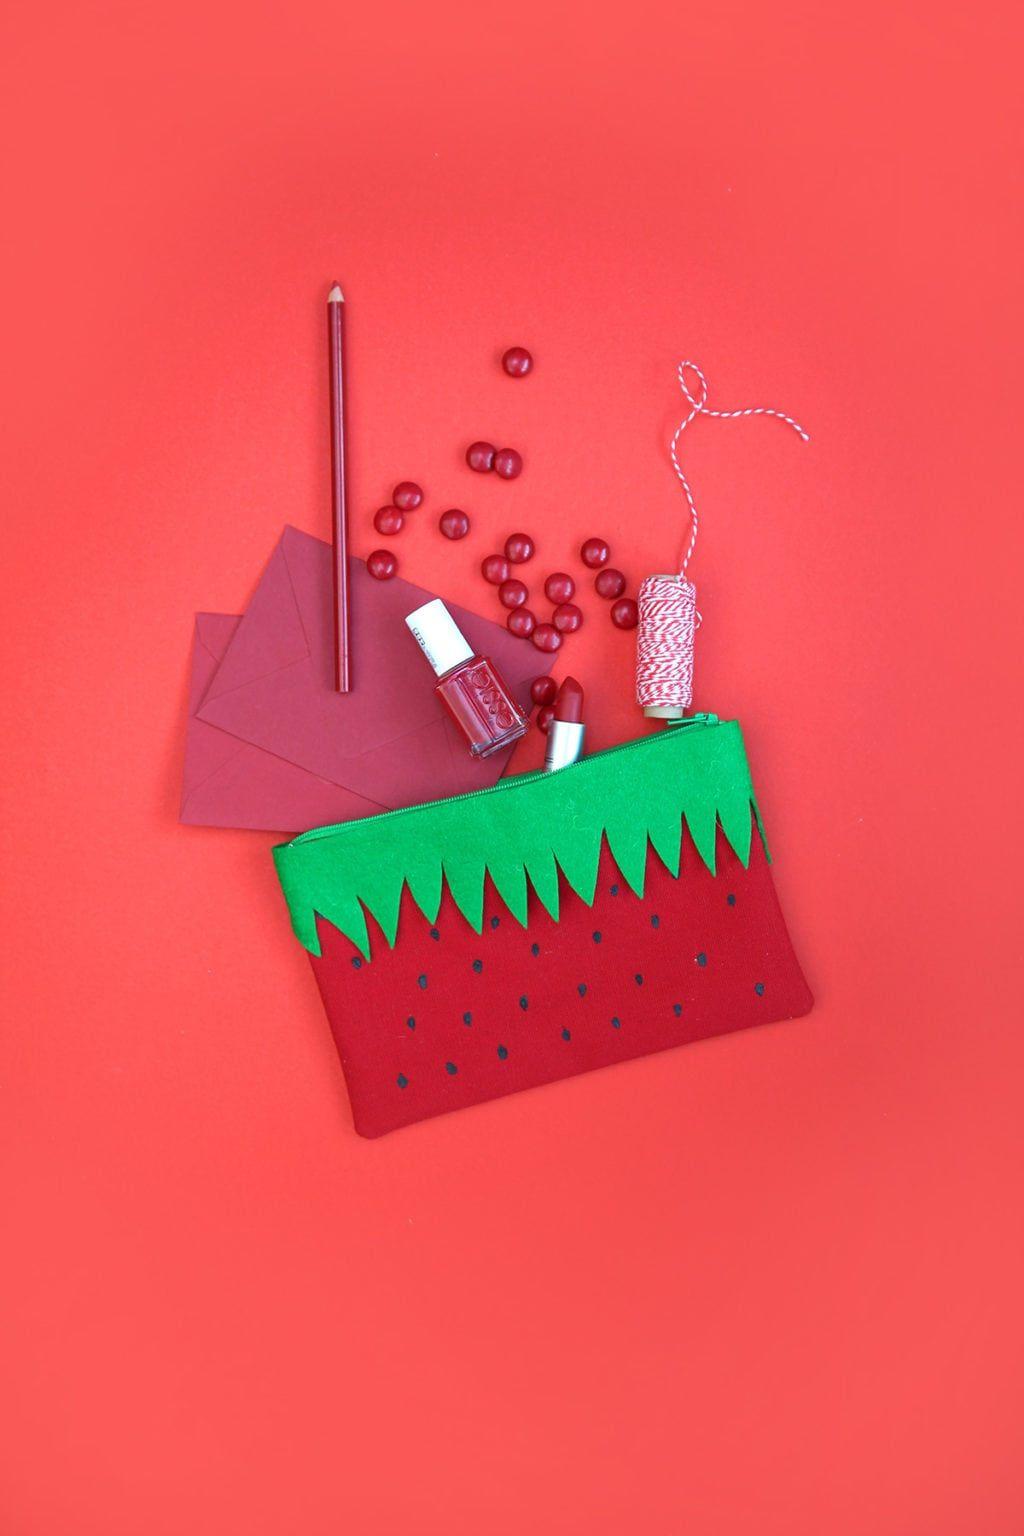 diy Tumblr gifts